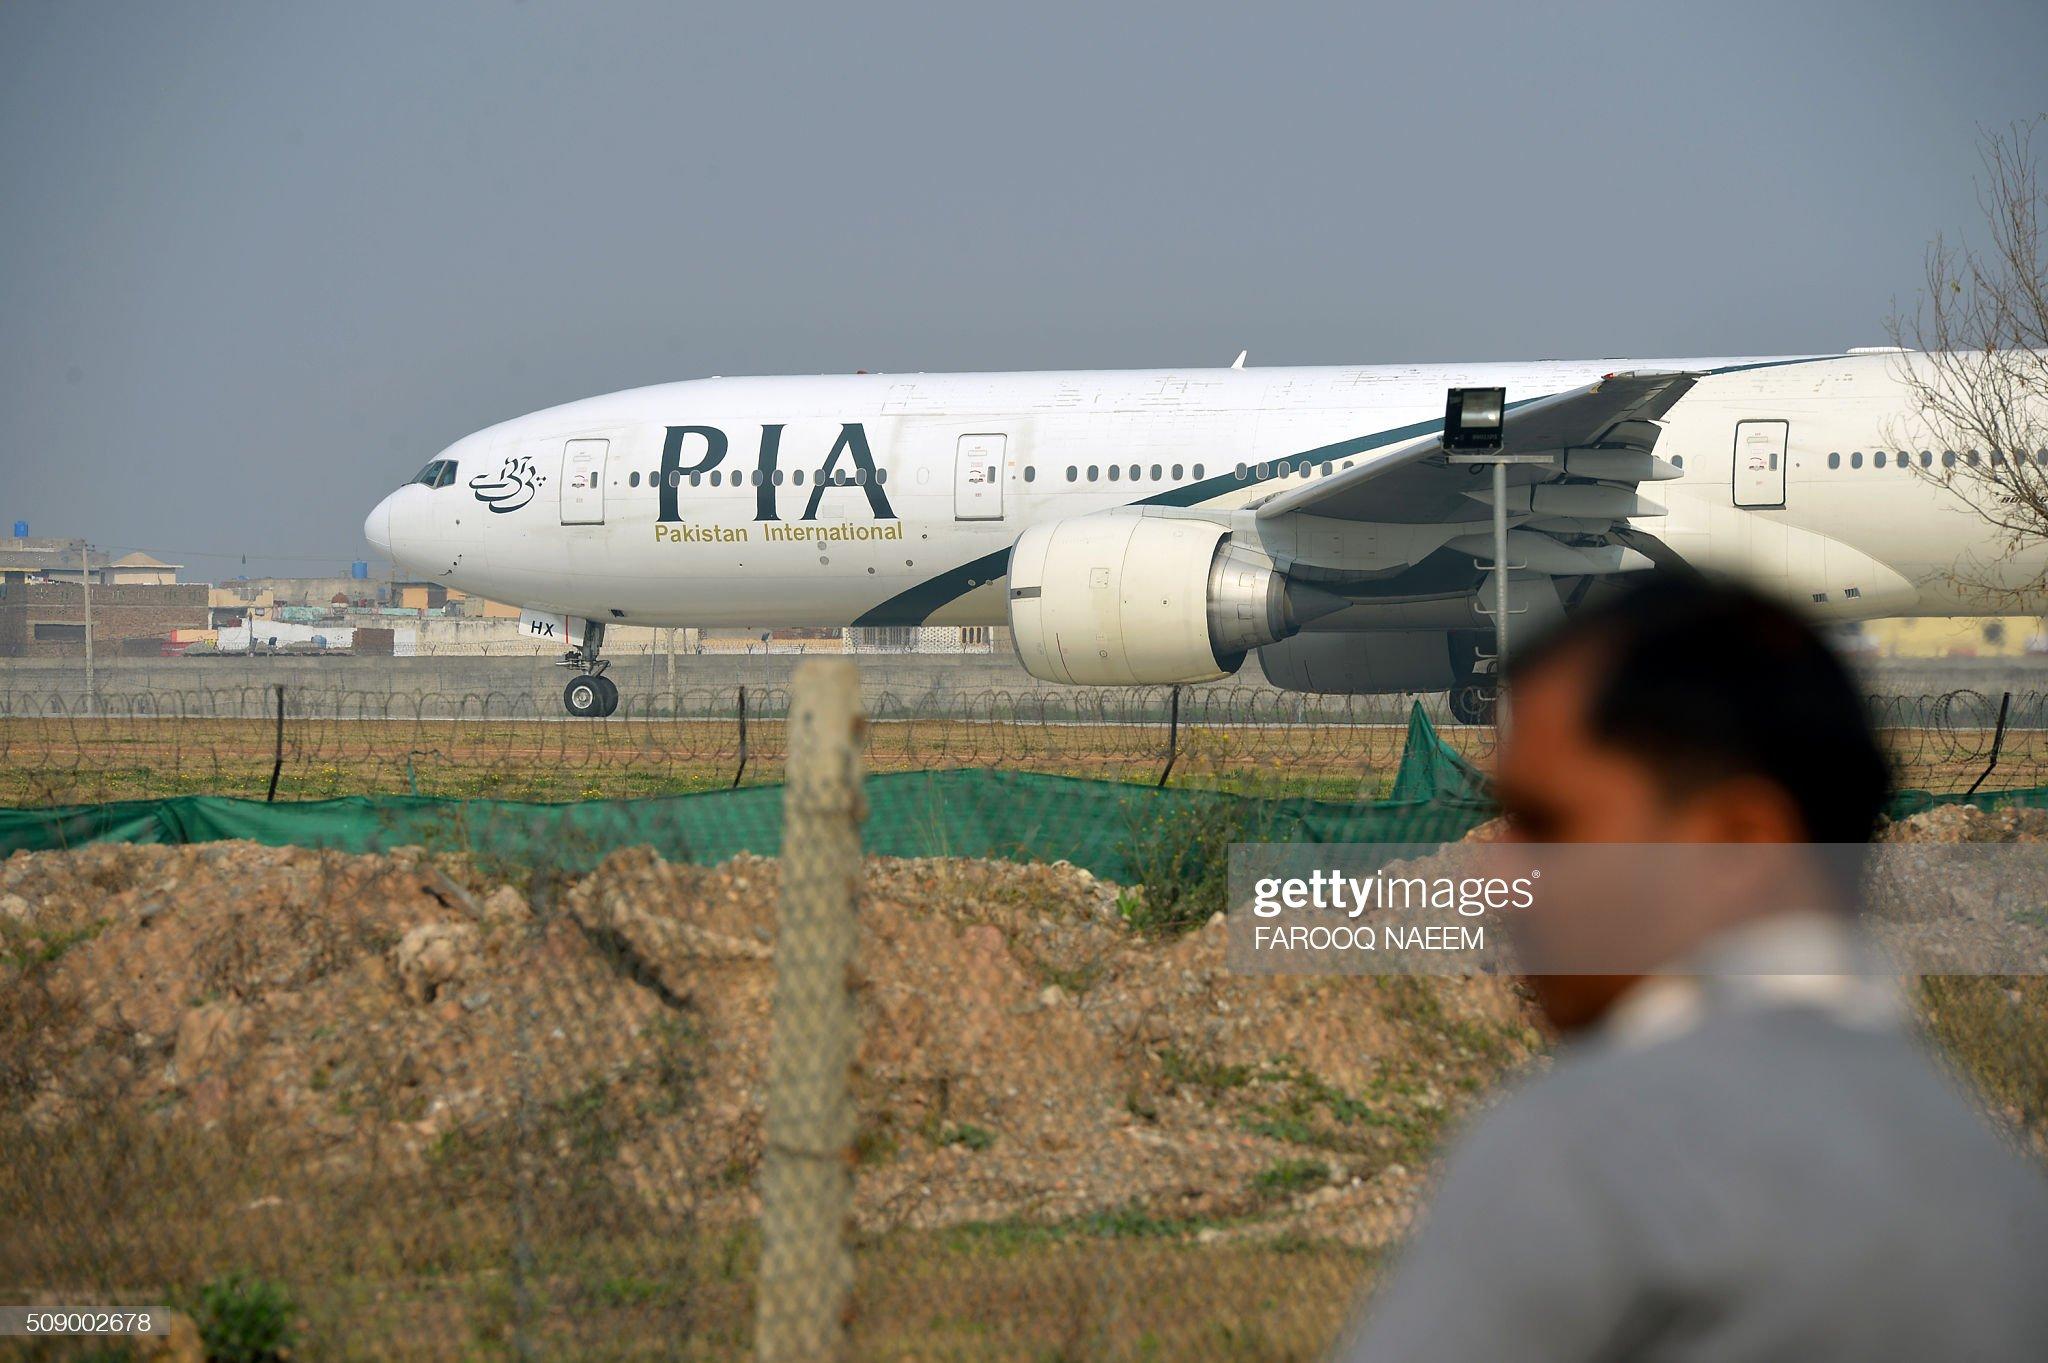 PAKISTAN-AVIATION-LABOUR-UNREST-STRIKE : News Photo